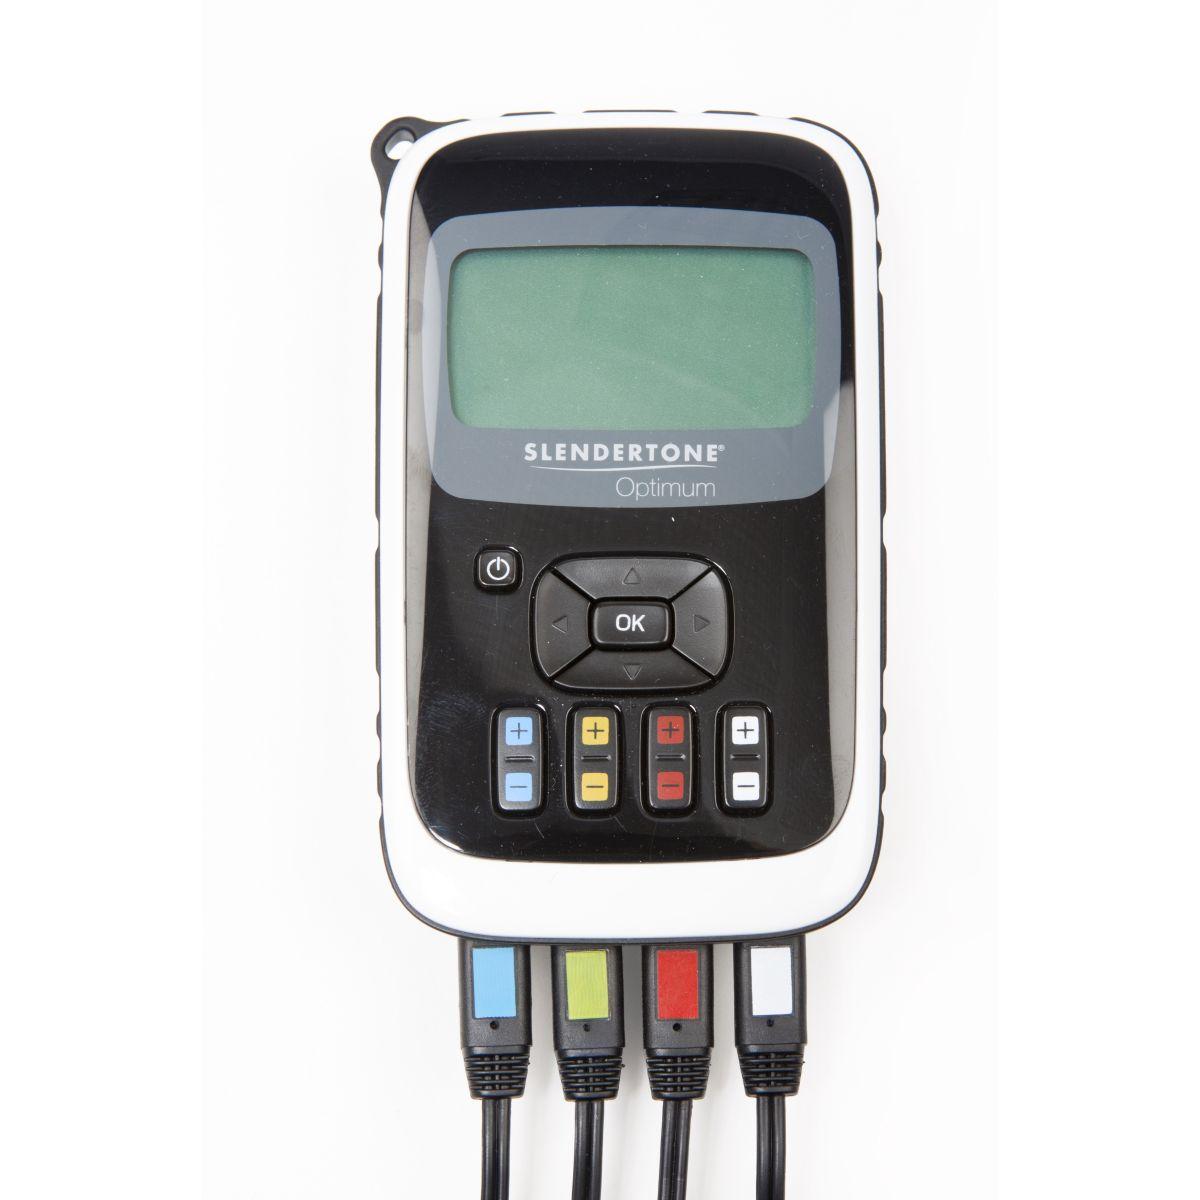 Electro-stimulation slendertone optimum - livraison offerte : code livpremium (photo)